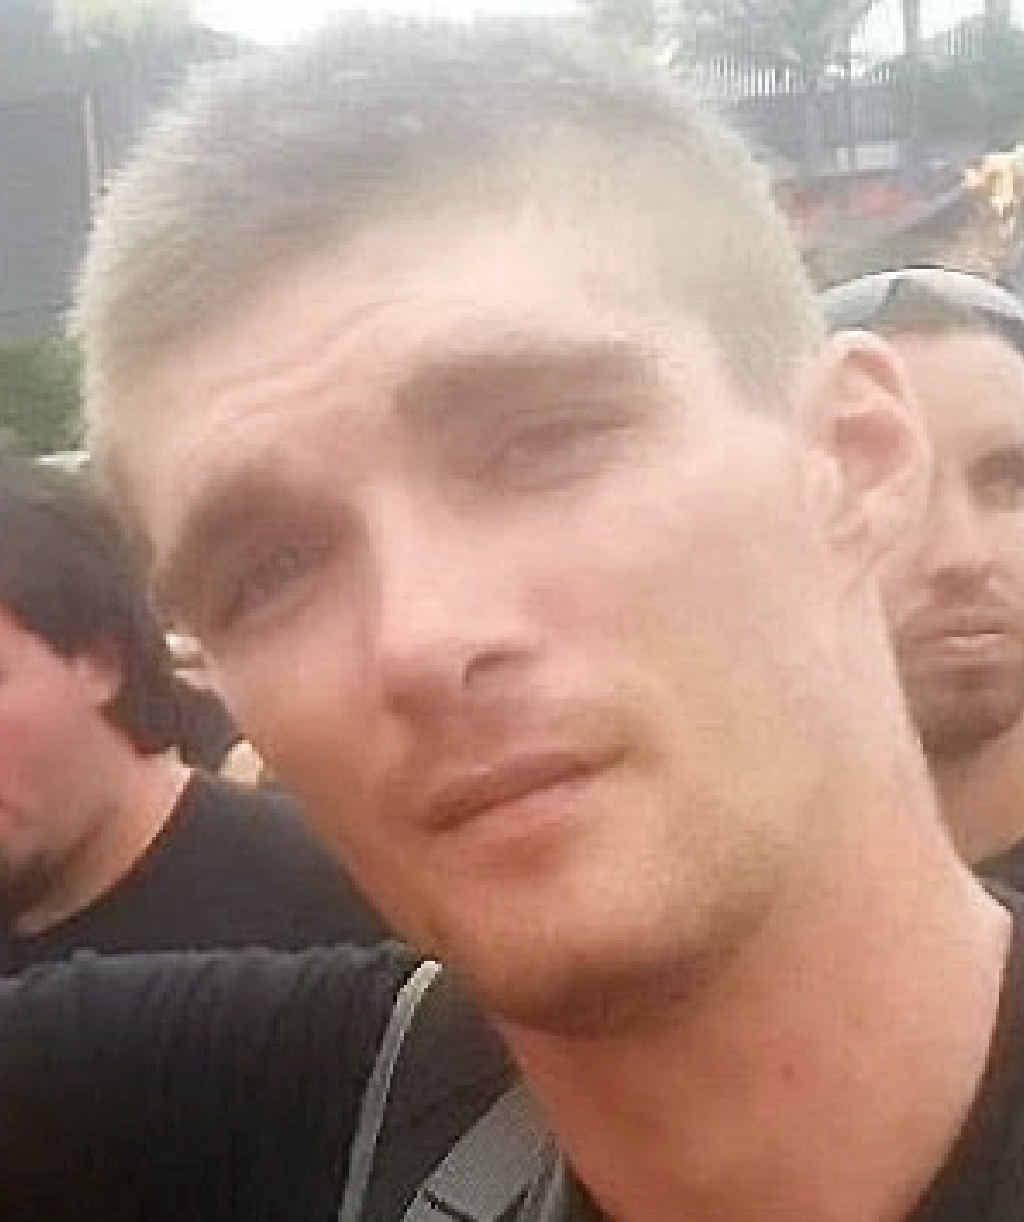 Benaraby stabbing victim Dean Robertson. Photo: Facebook.